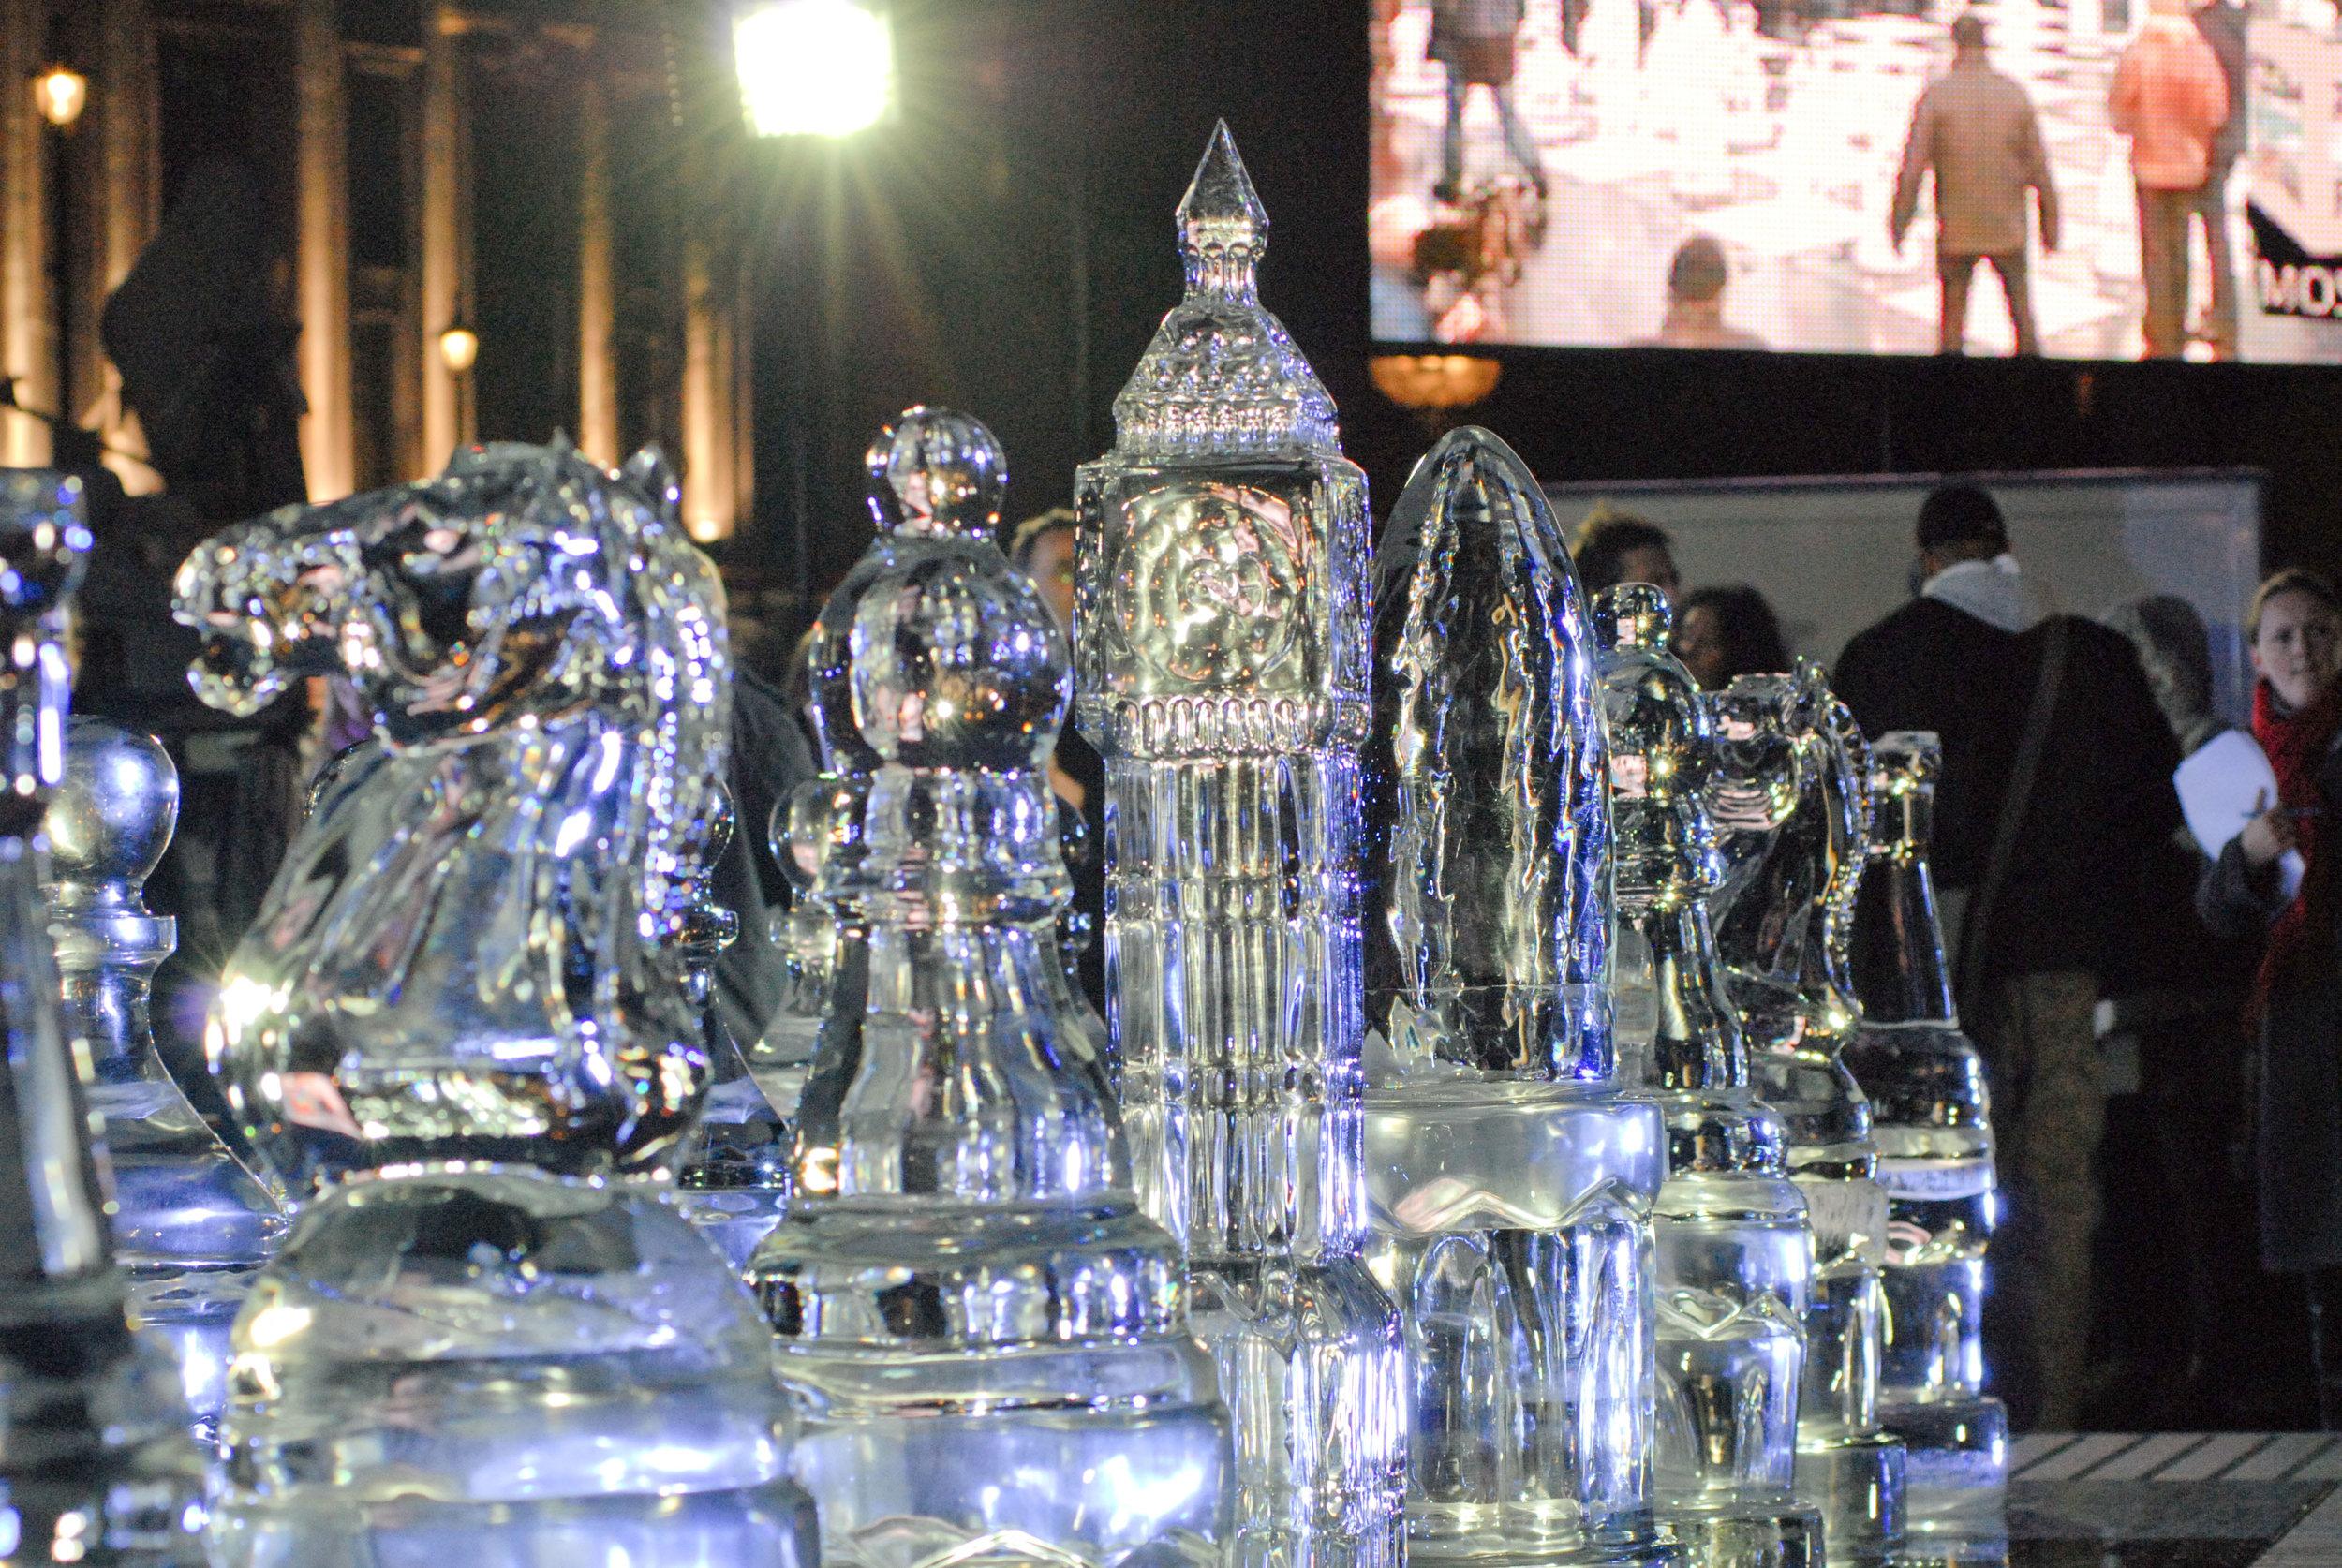 RWF2007 Chess Match 2007-01-11 08-45-34.jpg